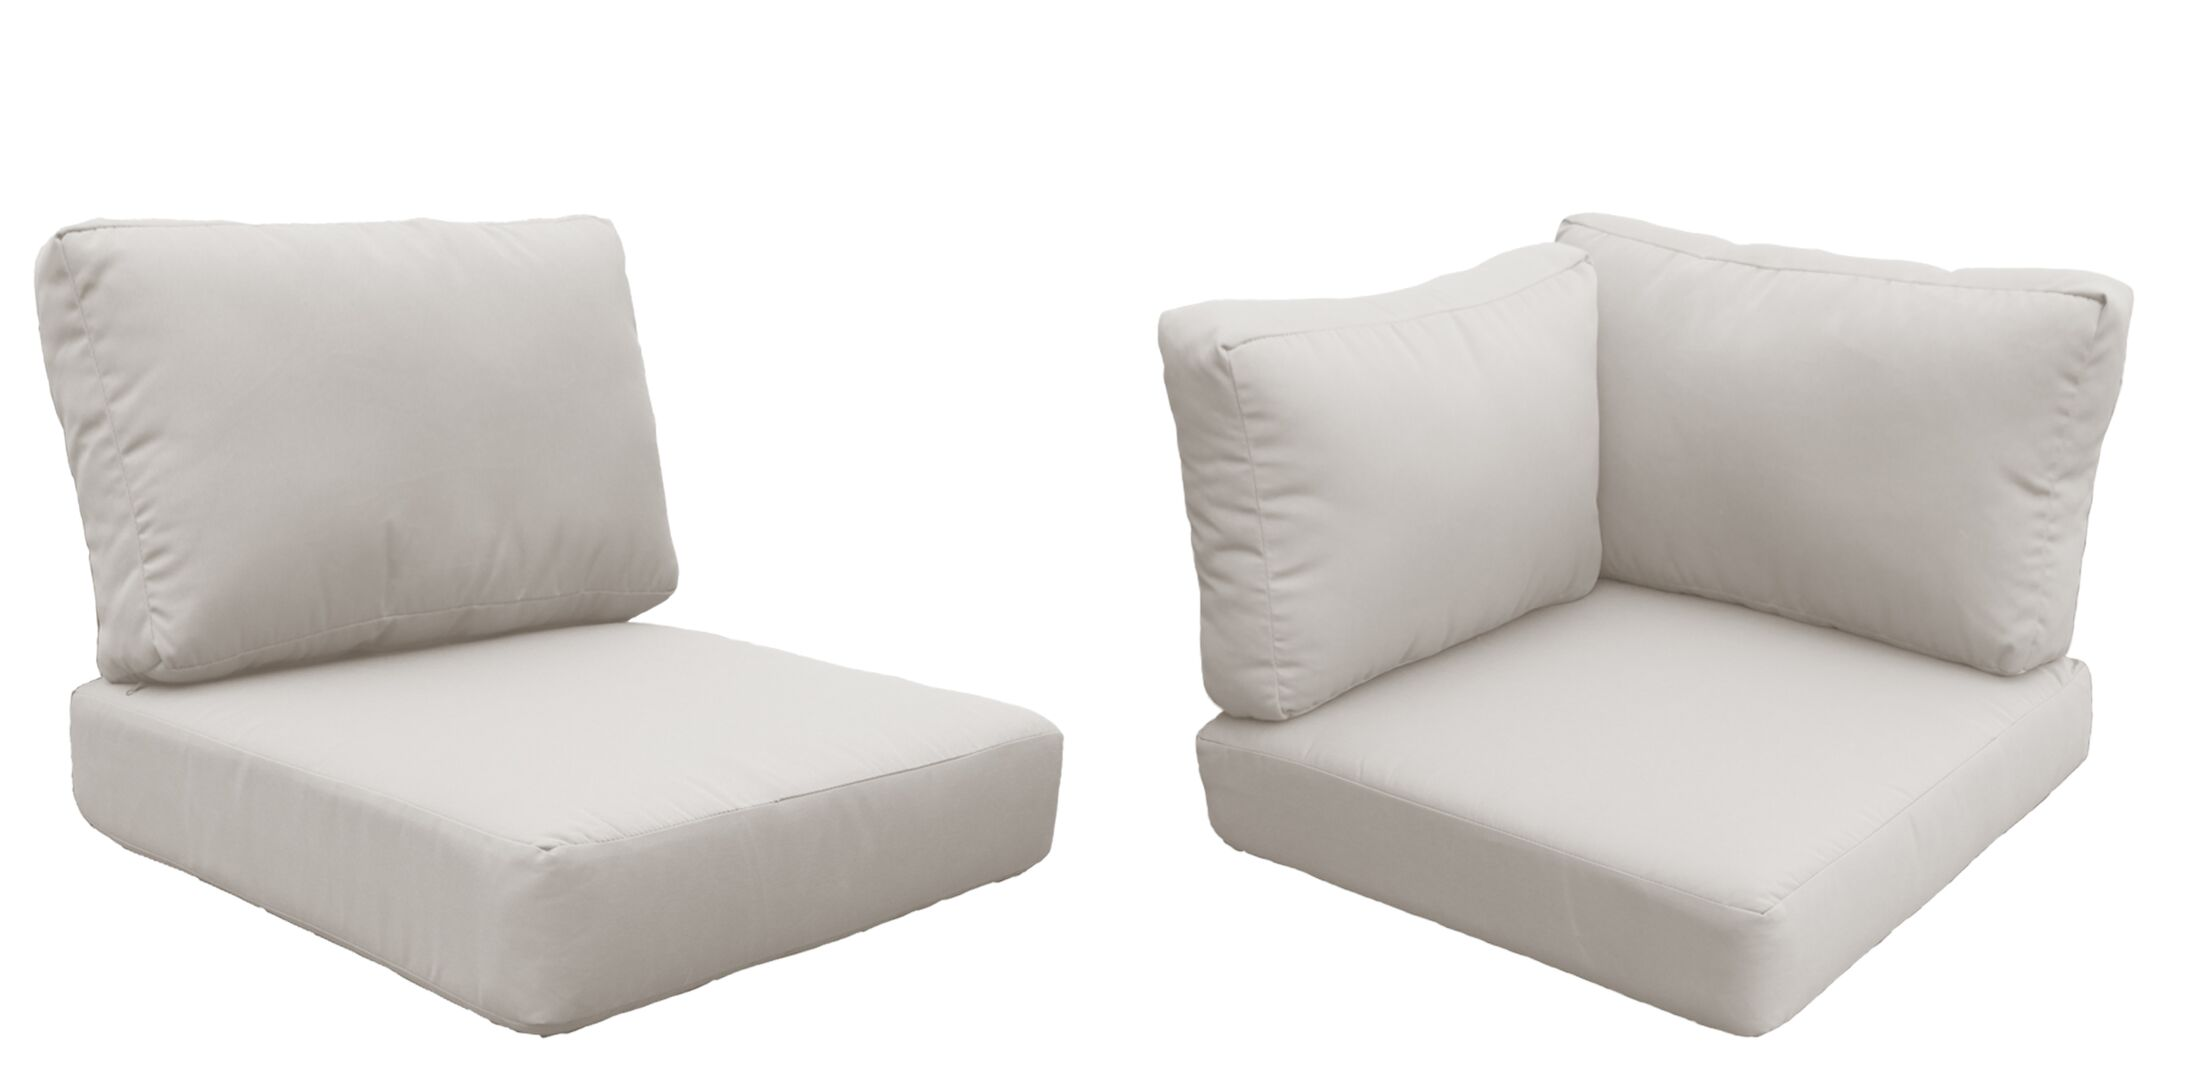 Barbados 17 Piece Outdoor Cushion Set Fabric: Beige